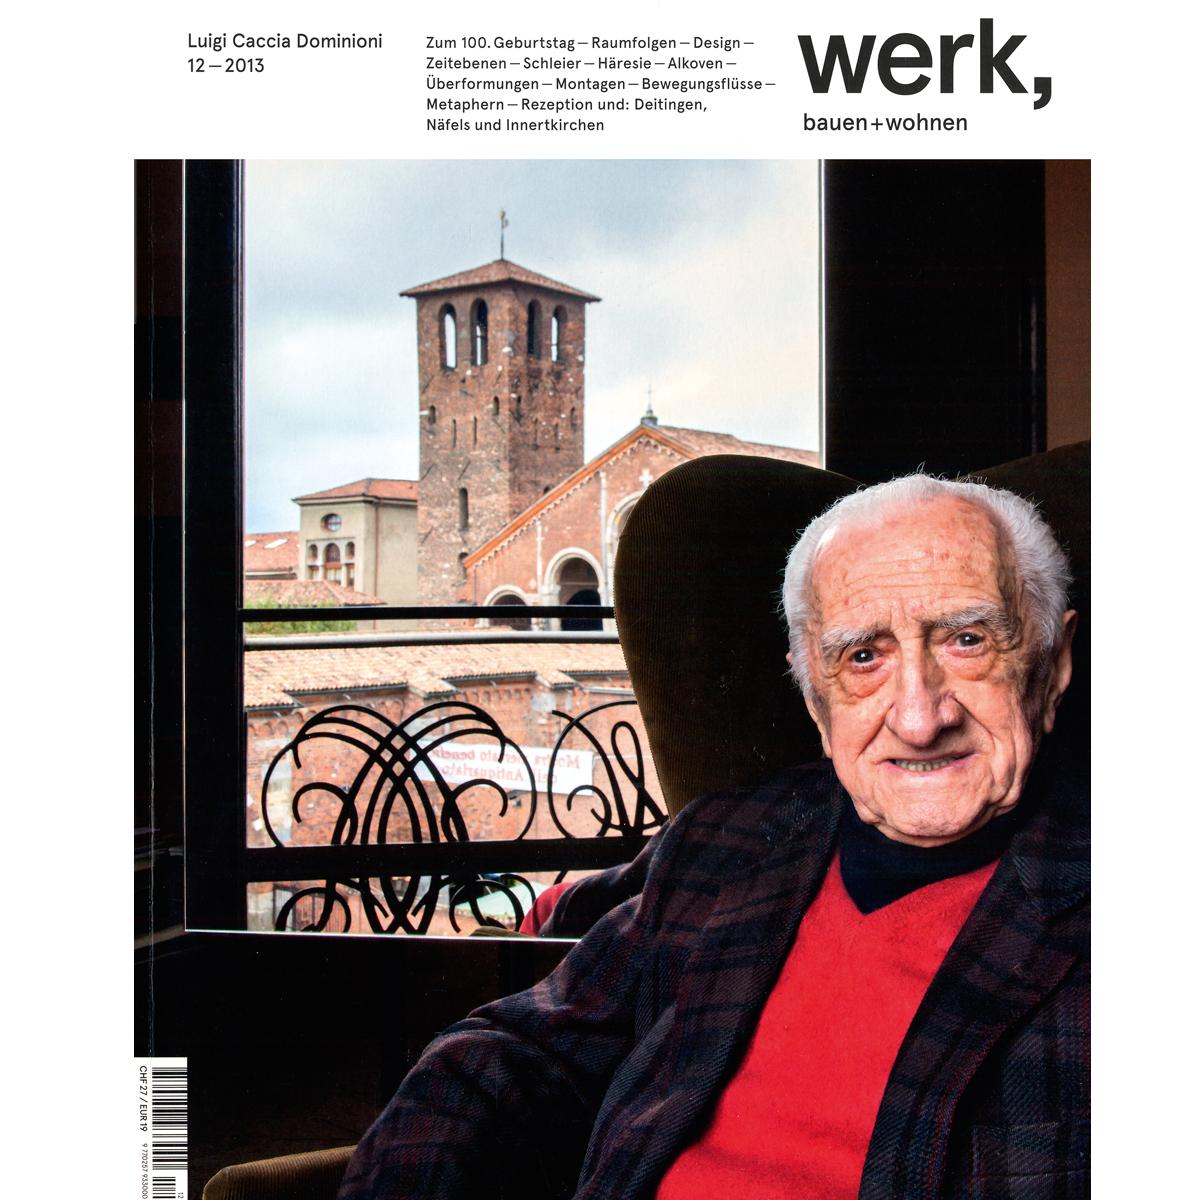 Werk: Luigi Caccia Dominioni